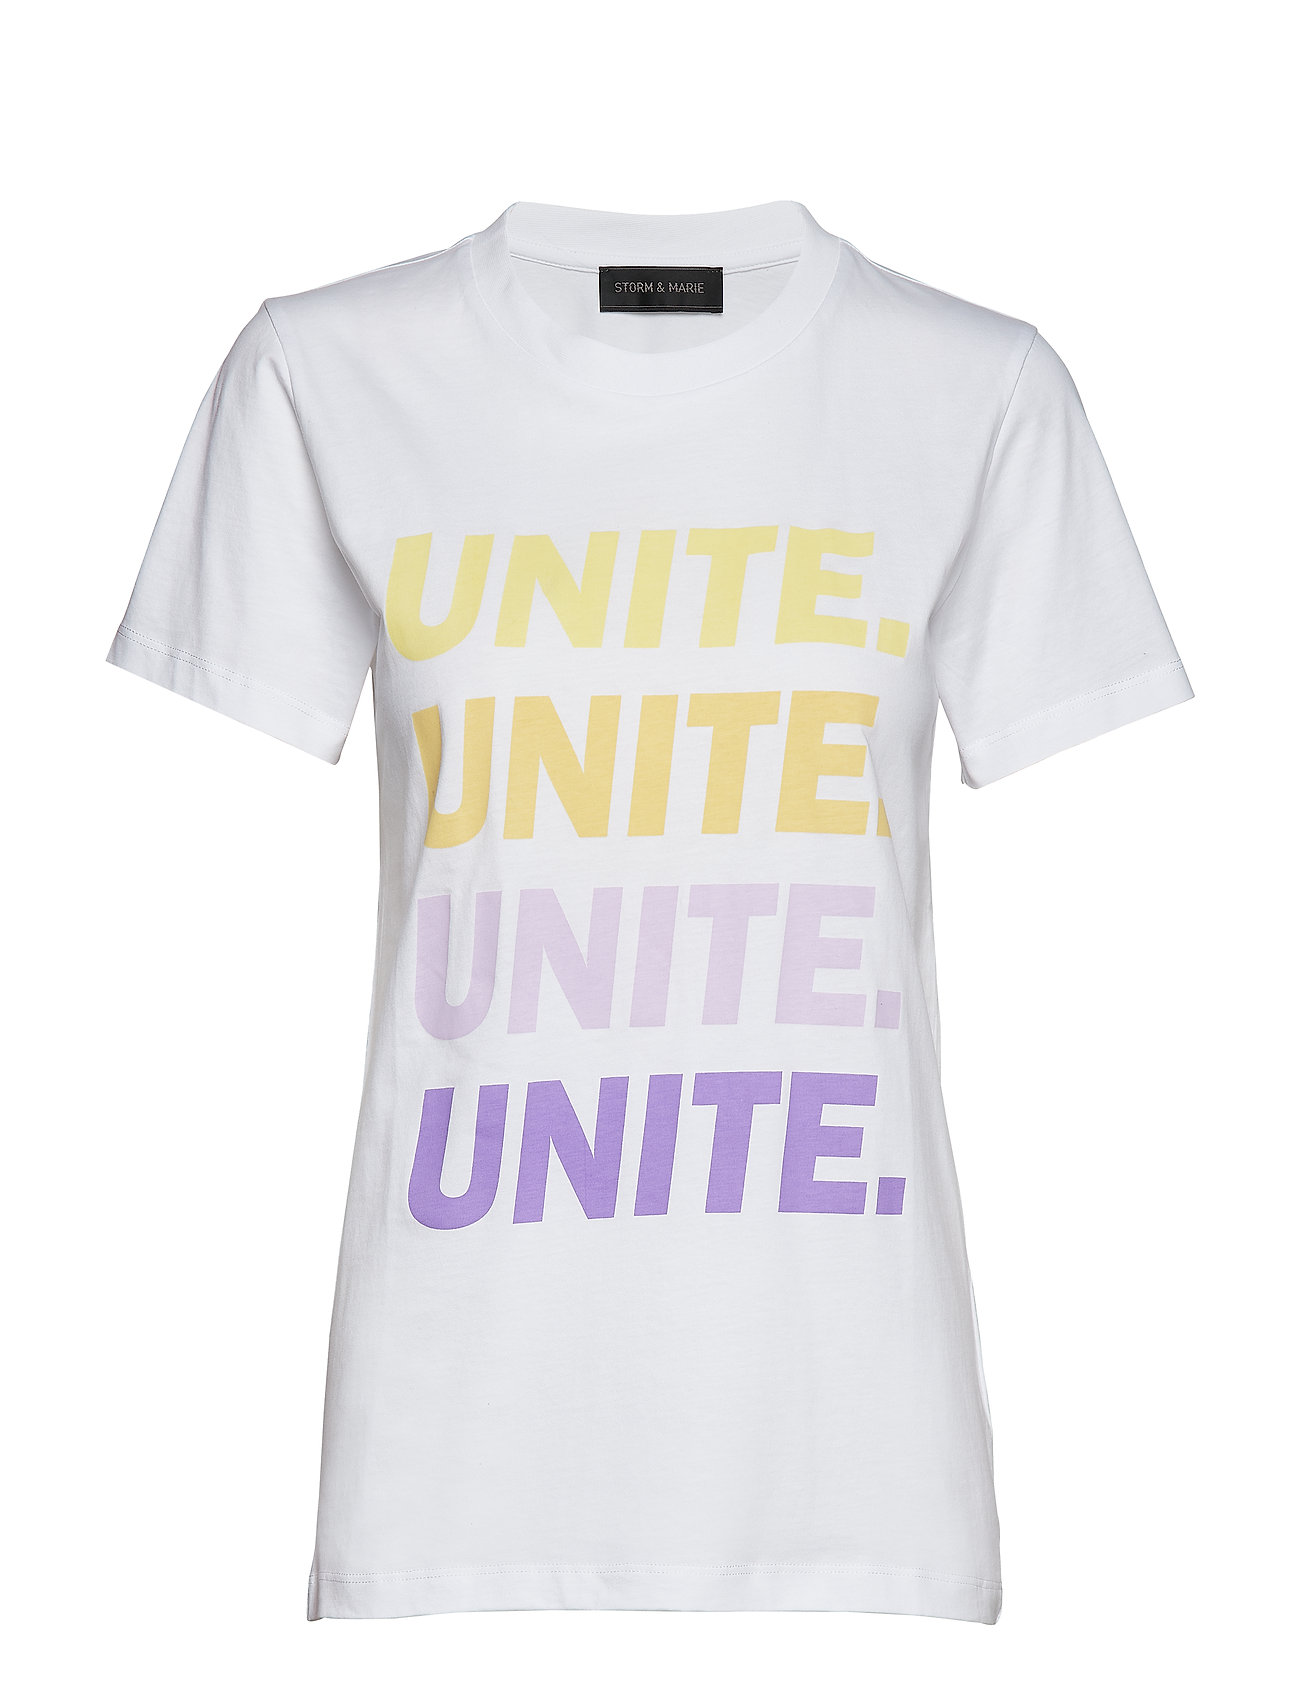 Storm & Marie UNITE-GRADE-TEE - BRIGHT WHITE